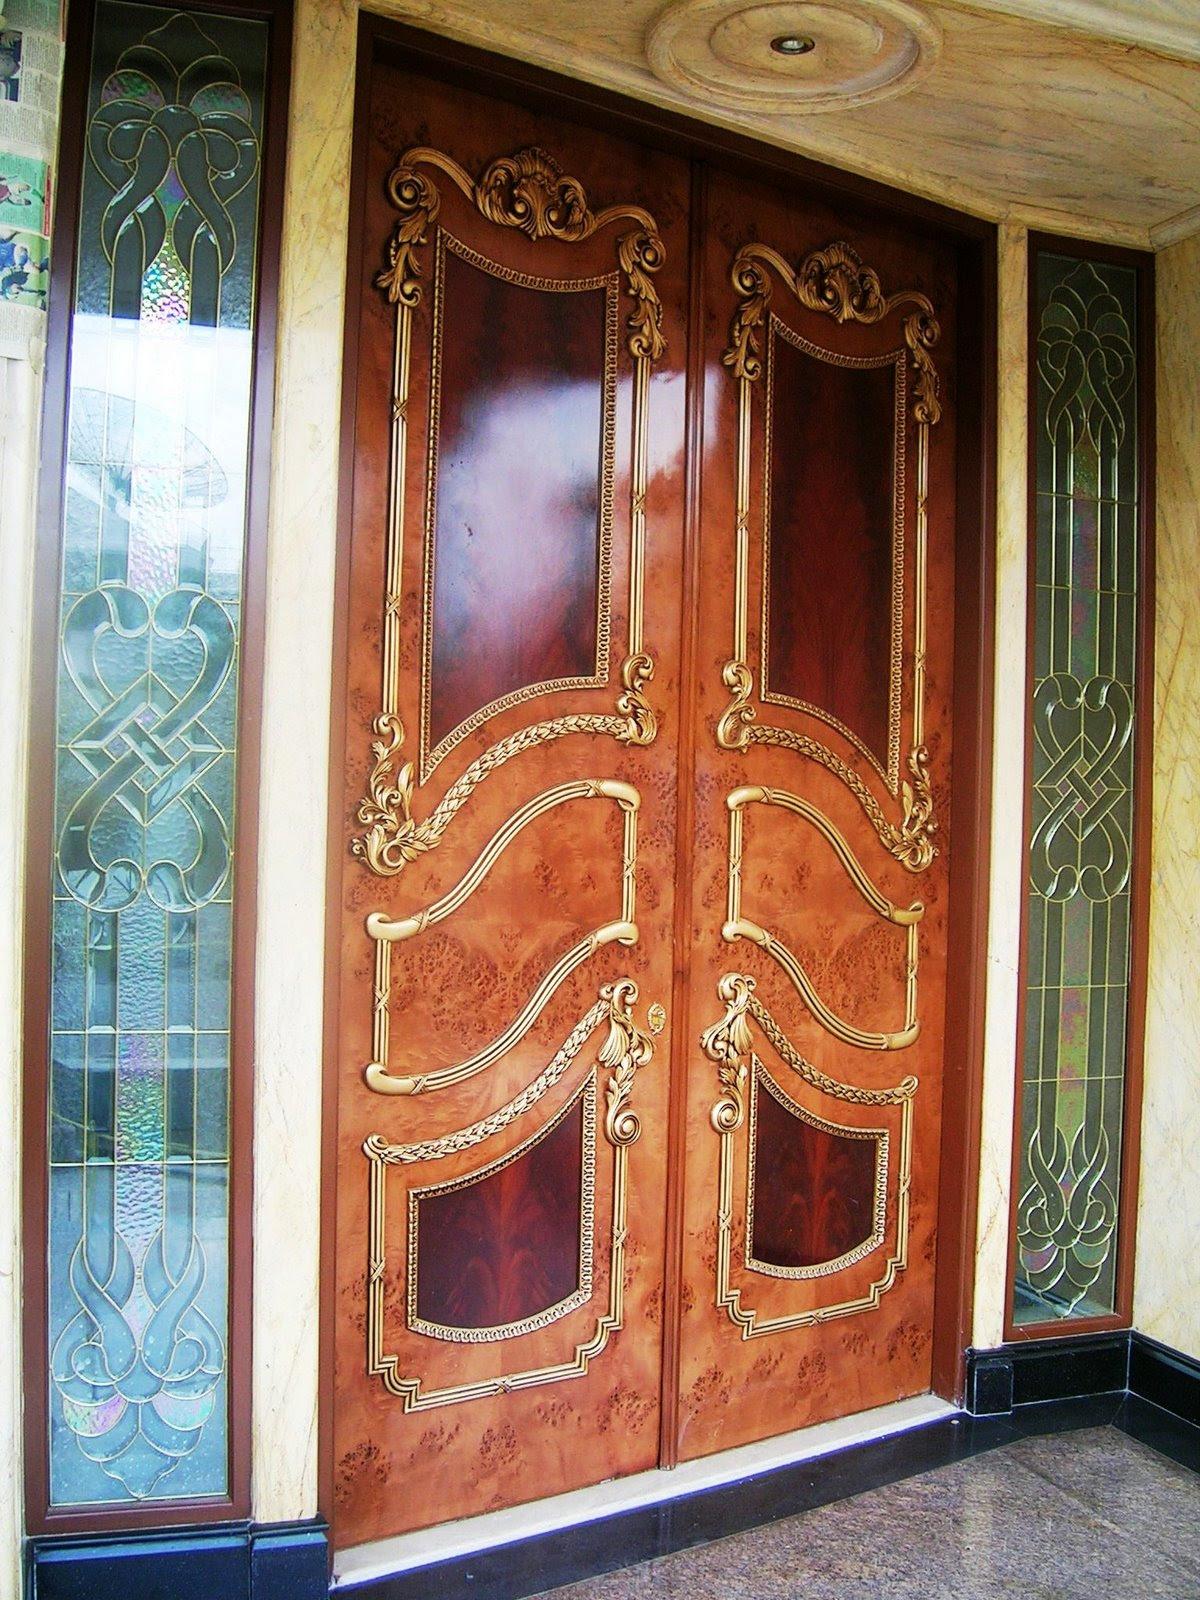 Contoh Daun Pintu Rumah Idaman ~ Gambar Rumah Idaman